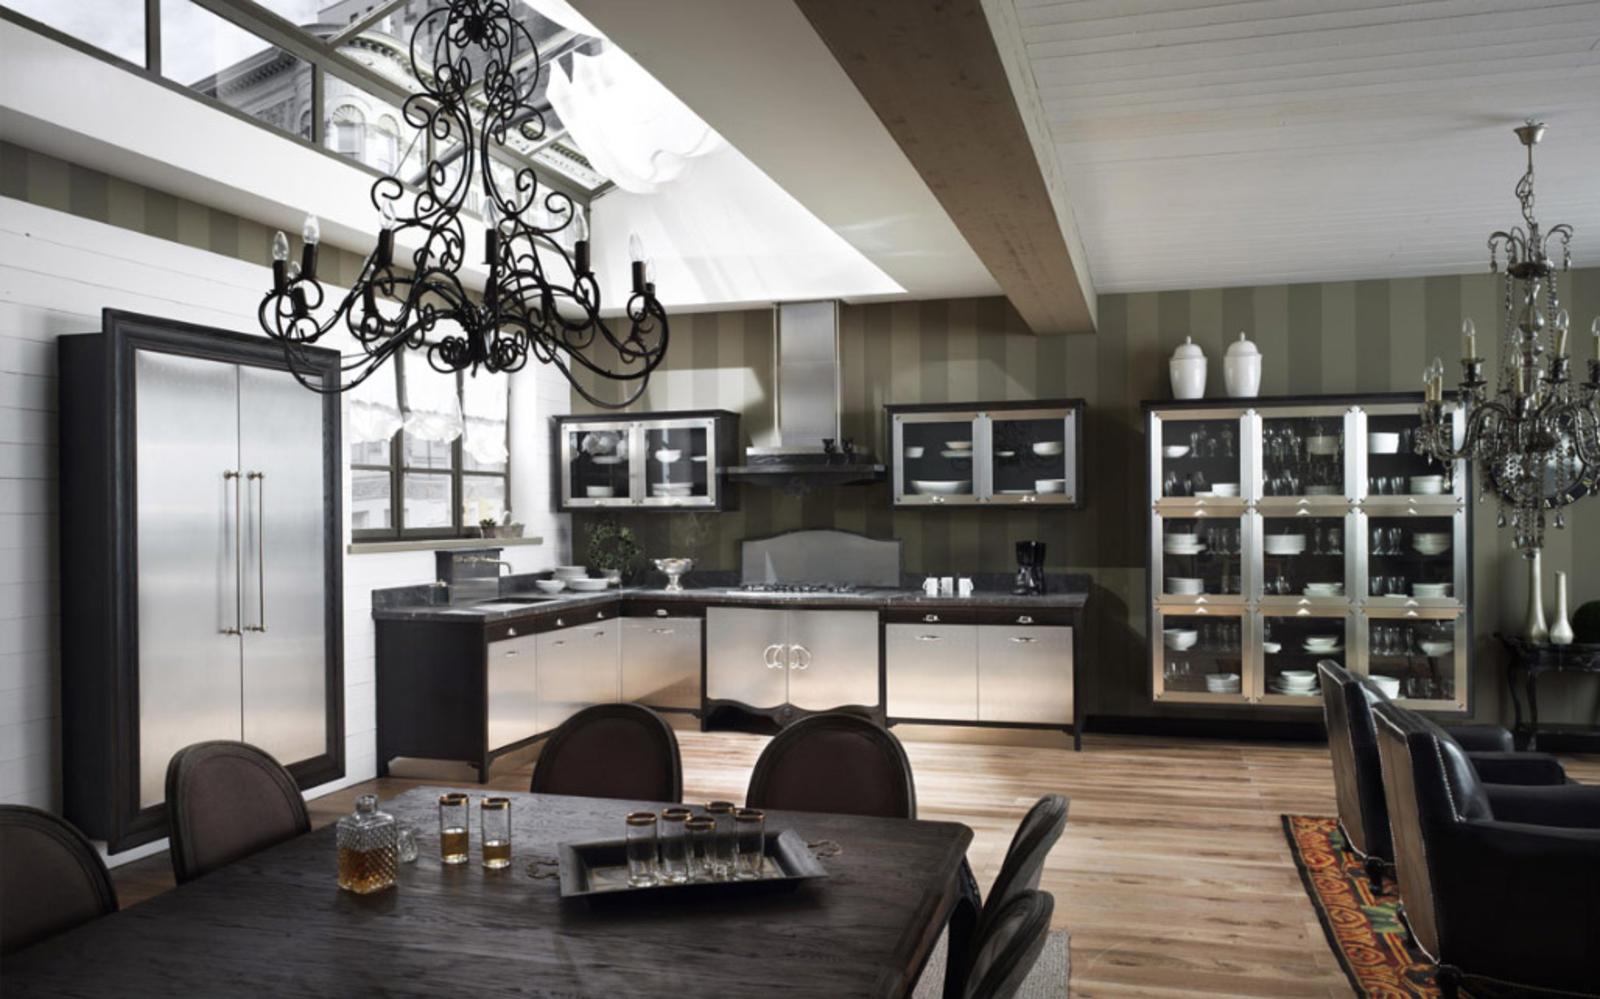 Modern classic kitchen interior design on vine for Modern classic house interior